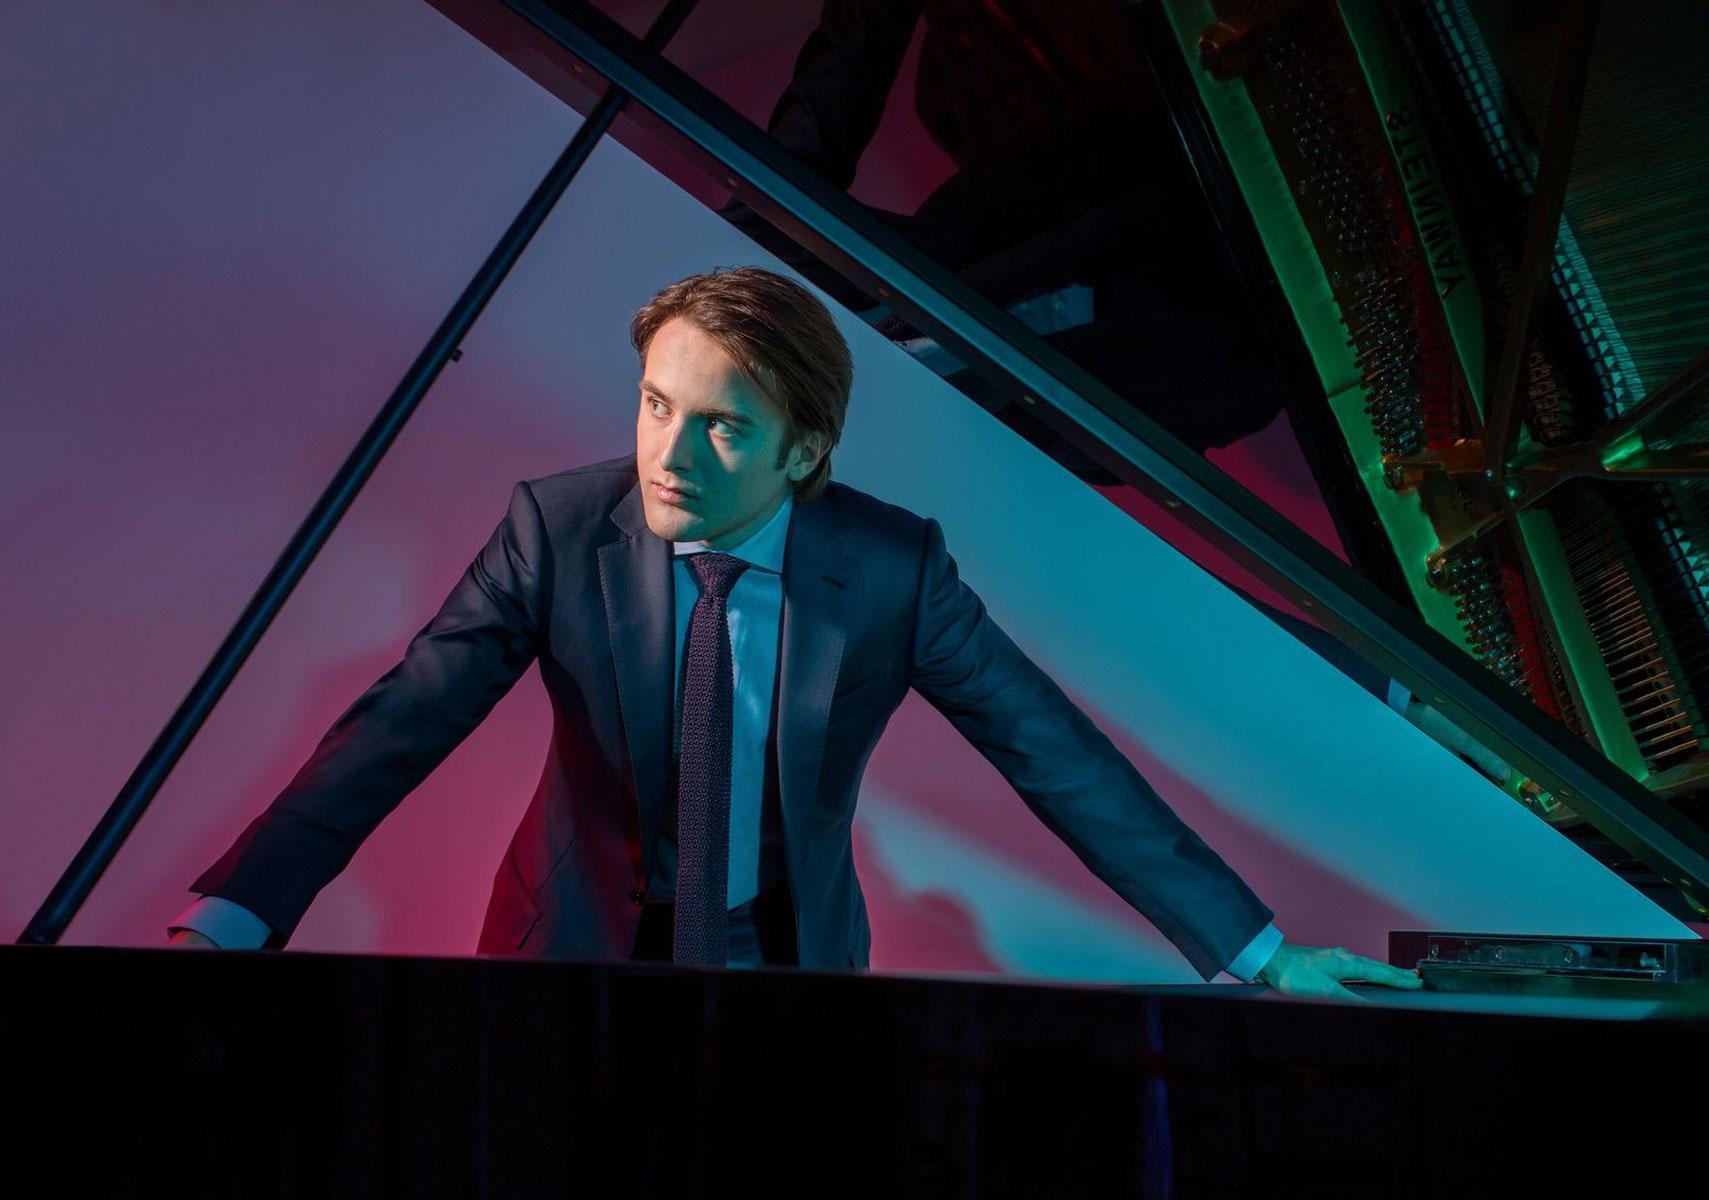 Music Break: Revisit Pianist Daniil Trifonov Playing Rachmaninoff